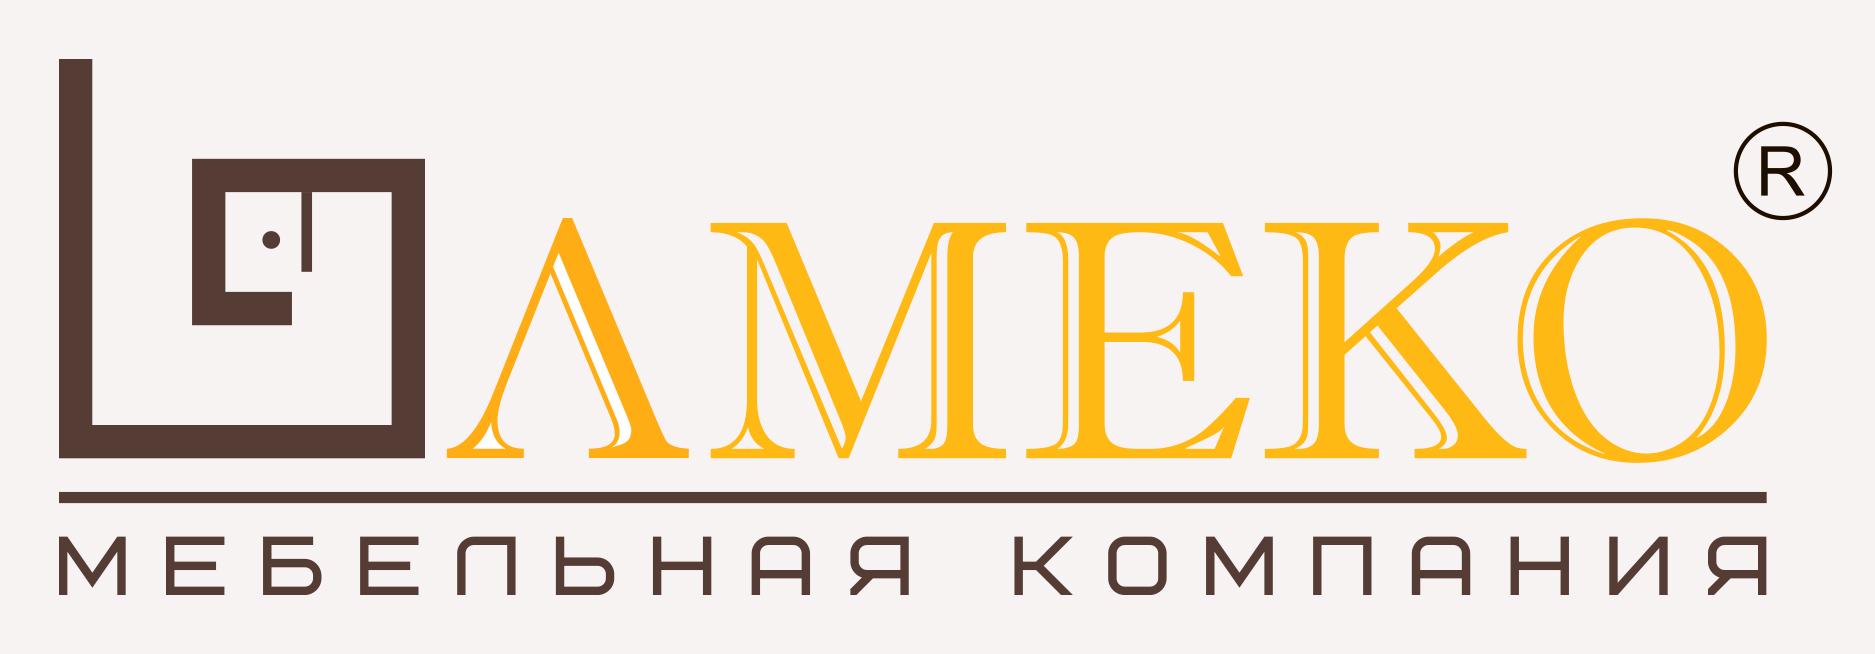 Ребрендинг/Редизайн логотипа Мебельной Фабрики фото f_926548ddc986e761.jpg